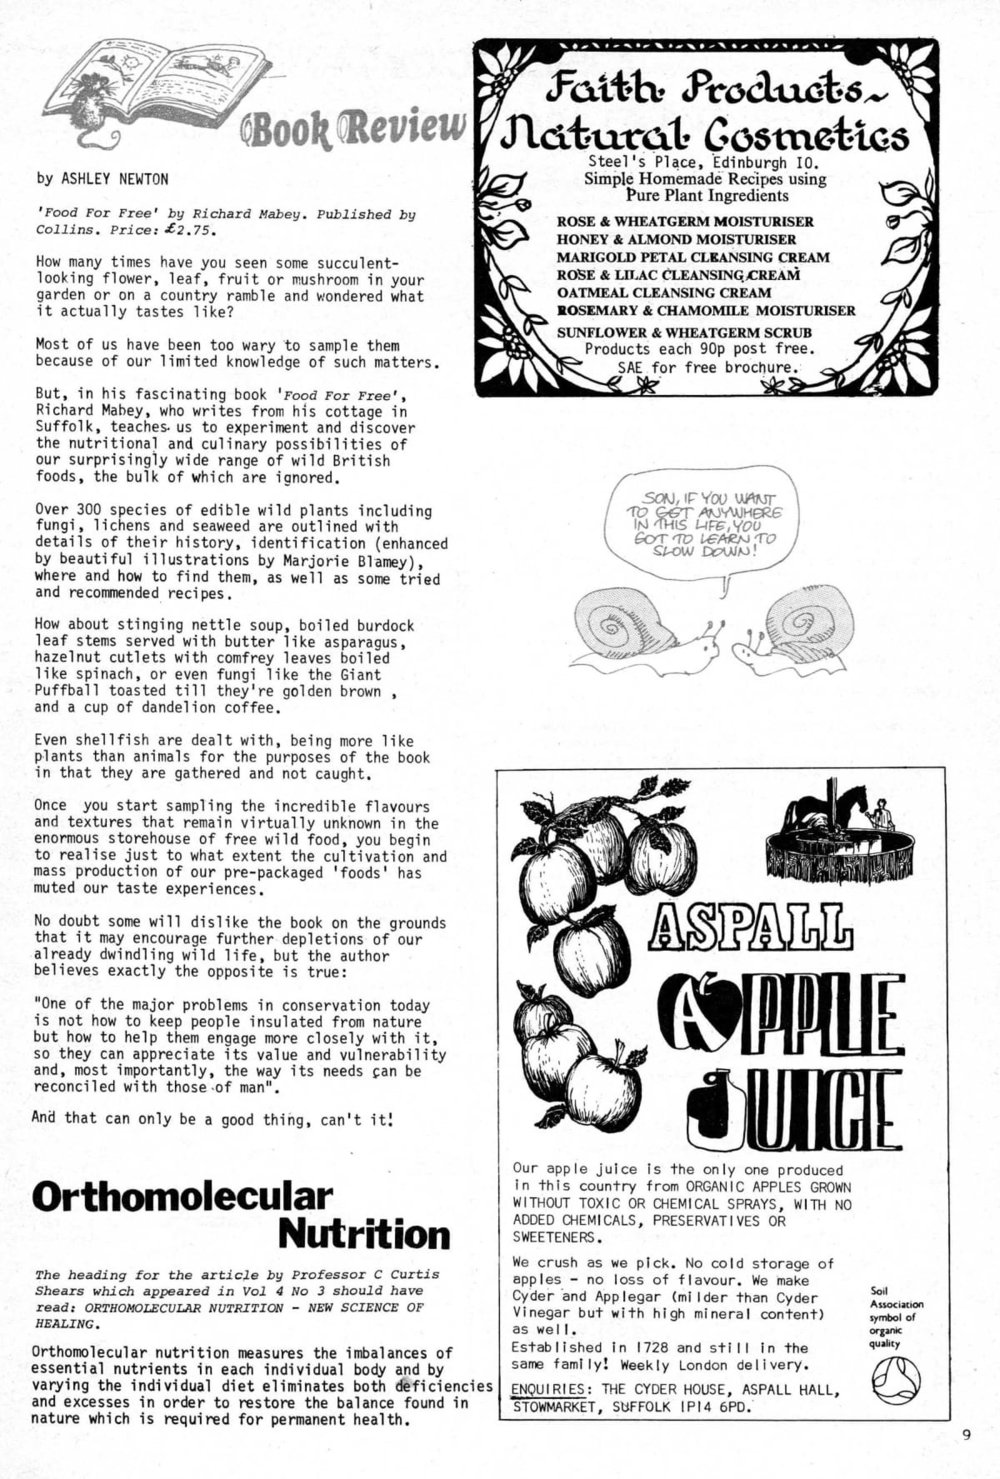 seed-v4-n4-april1975-09.jpg